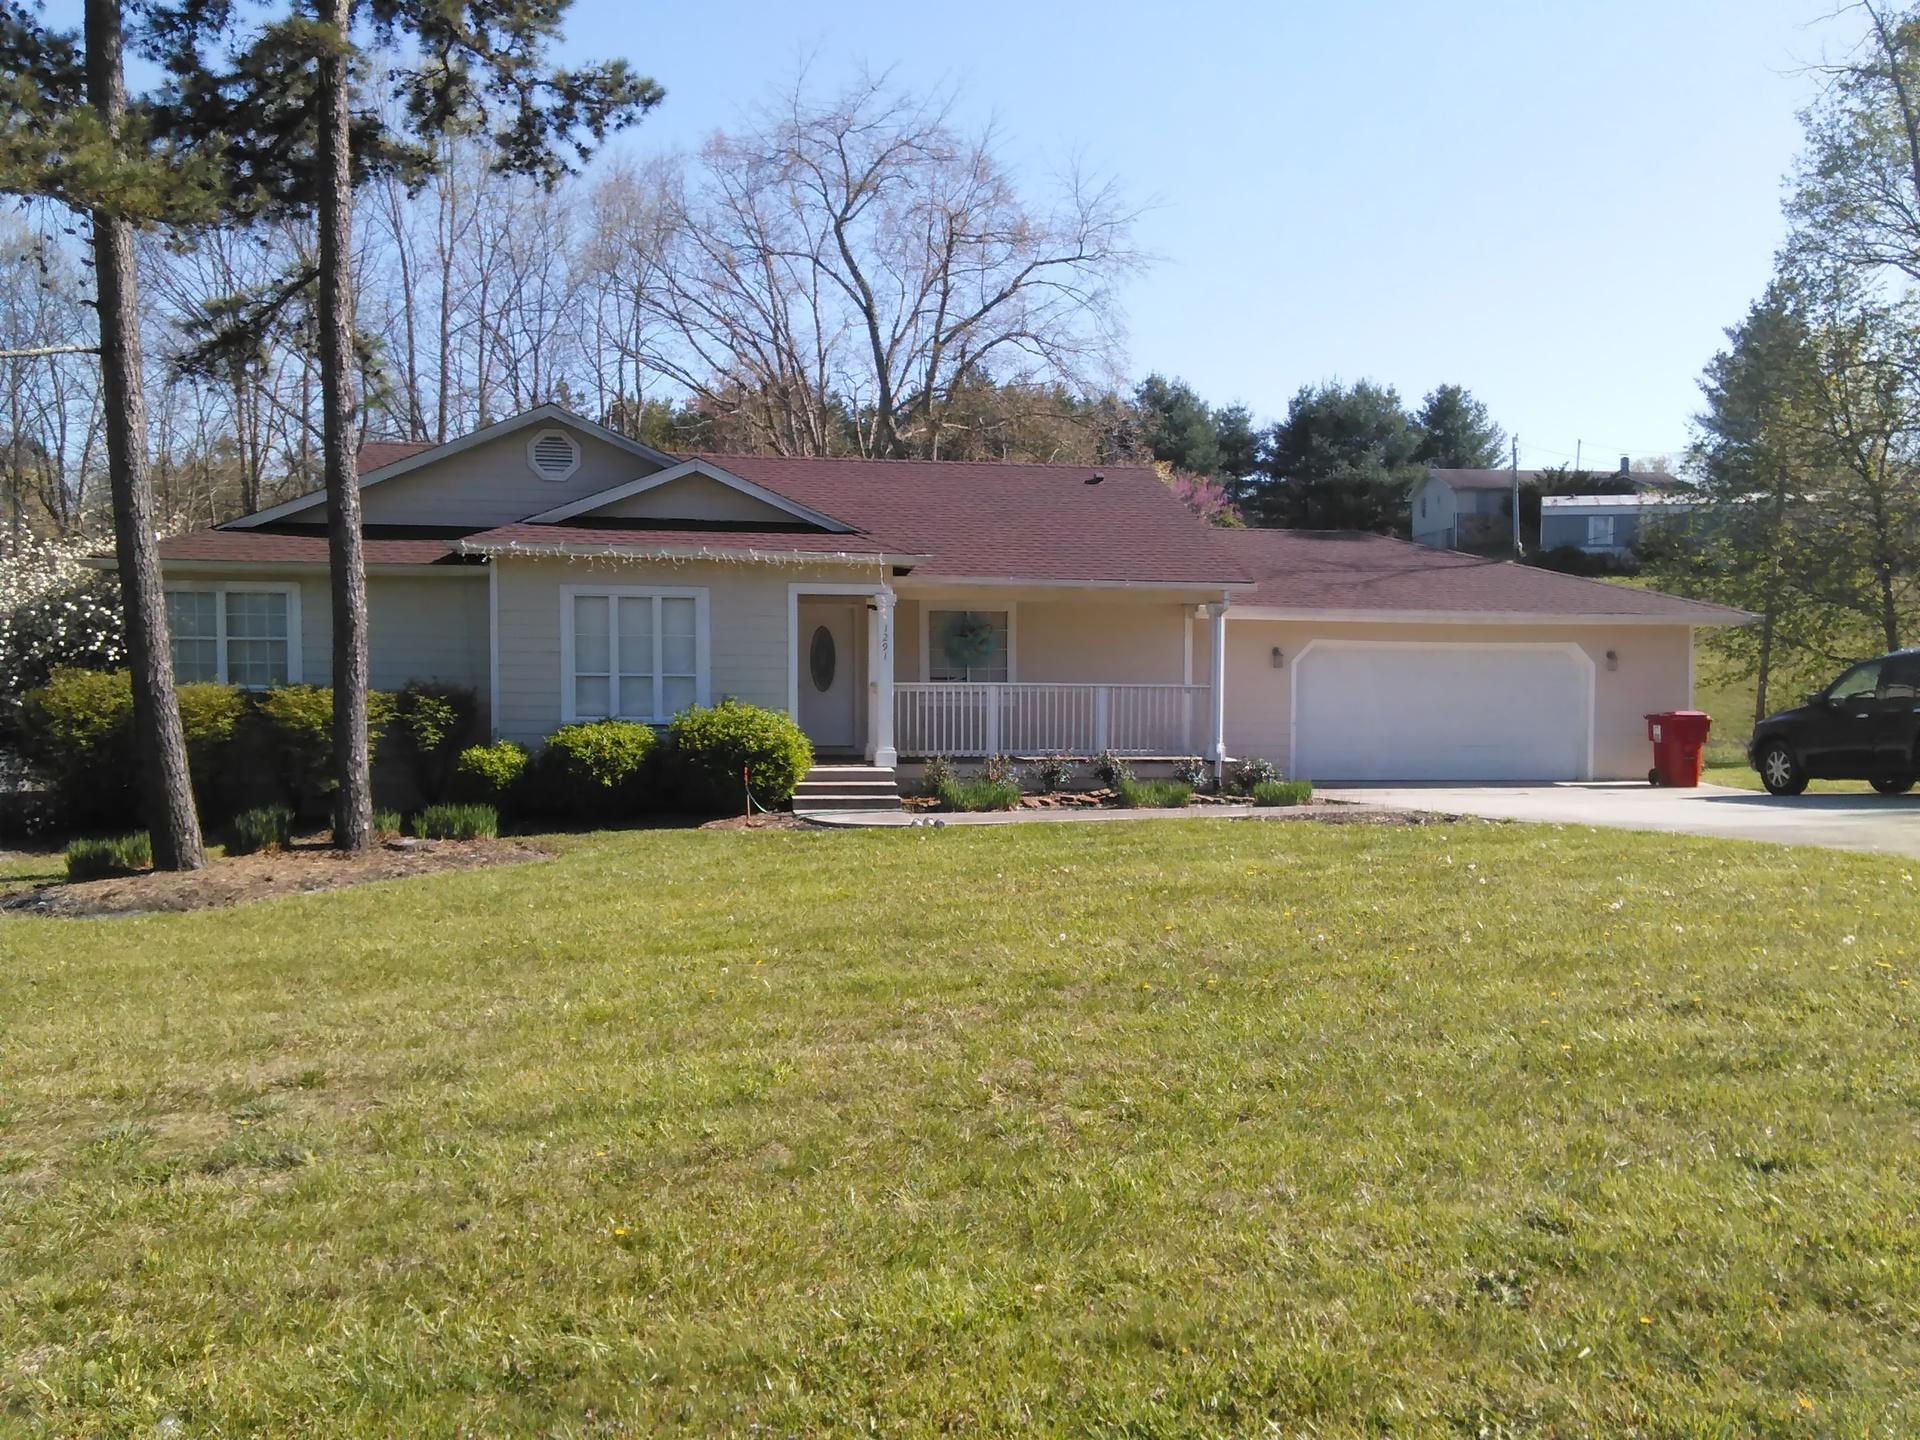 Peaceful home | codenamesailorearth, architecture, dwelling, lawn